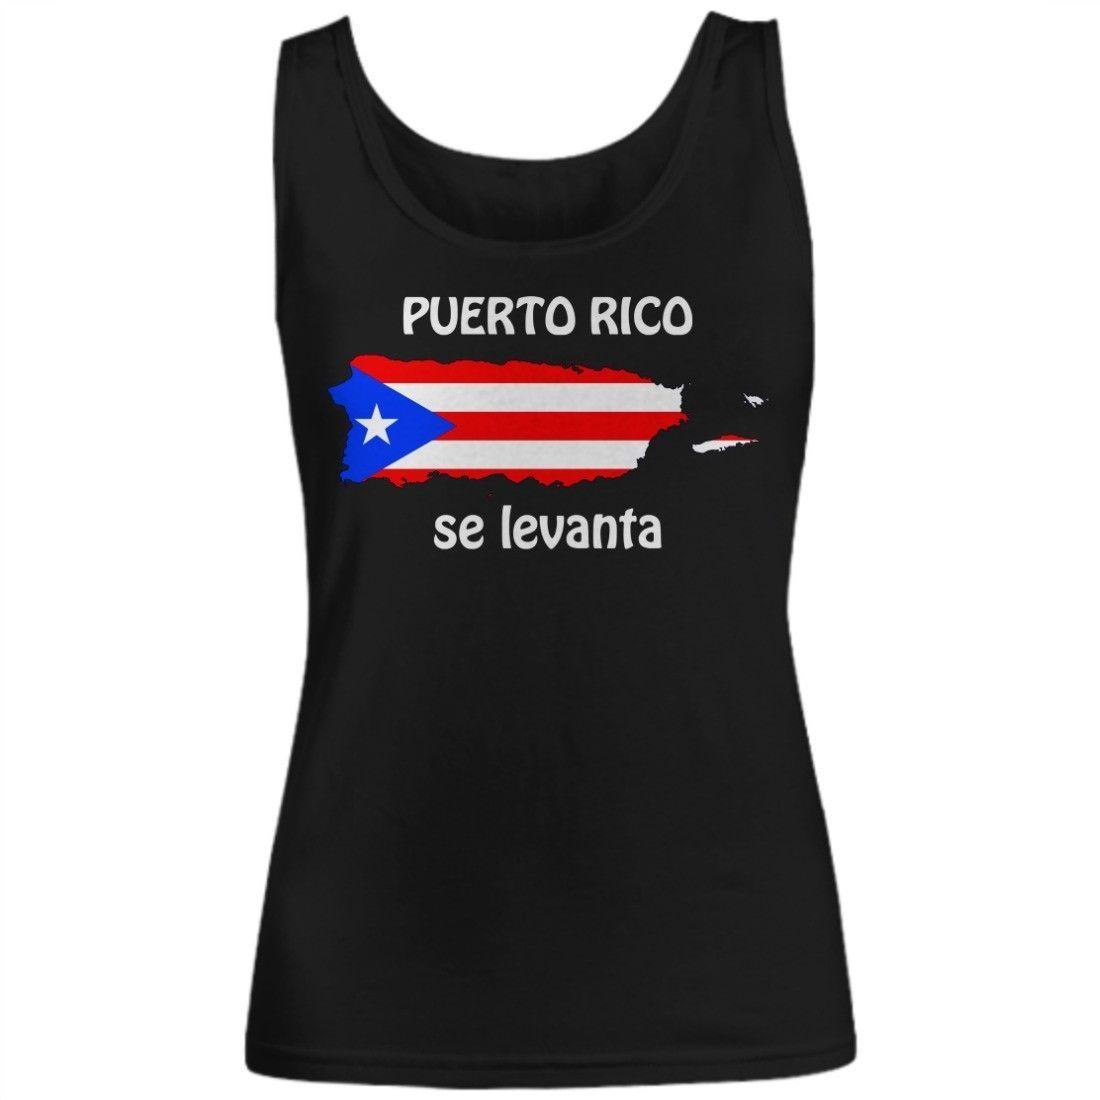 Puerto Rico Se Levanta PR Flag Pride Gift for Her Ladies Womens Tank Top Shirt - $19.11